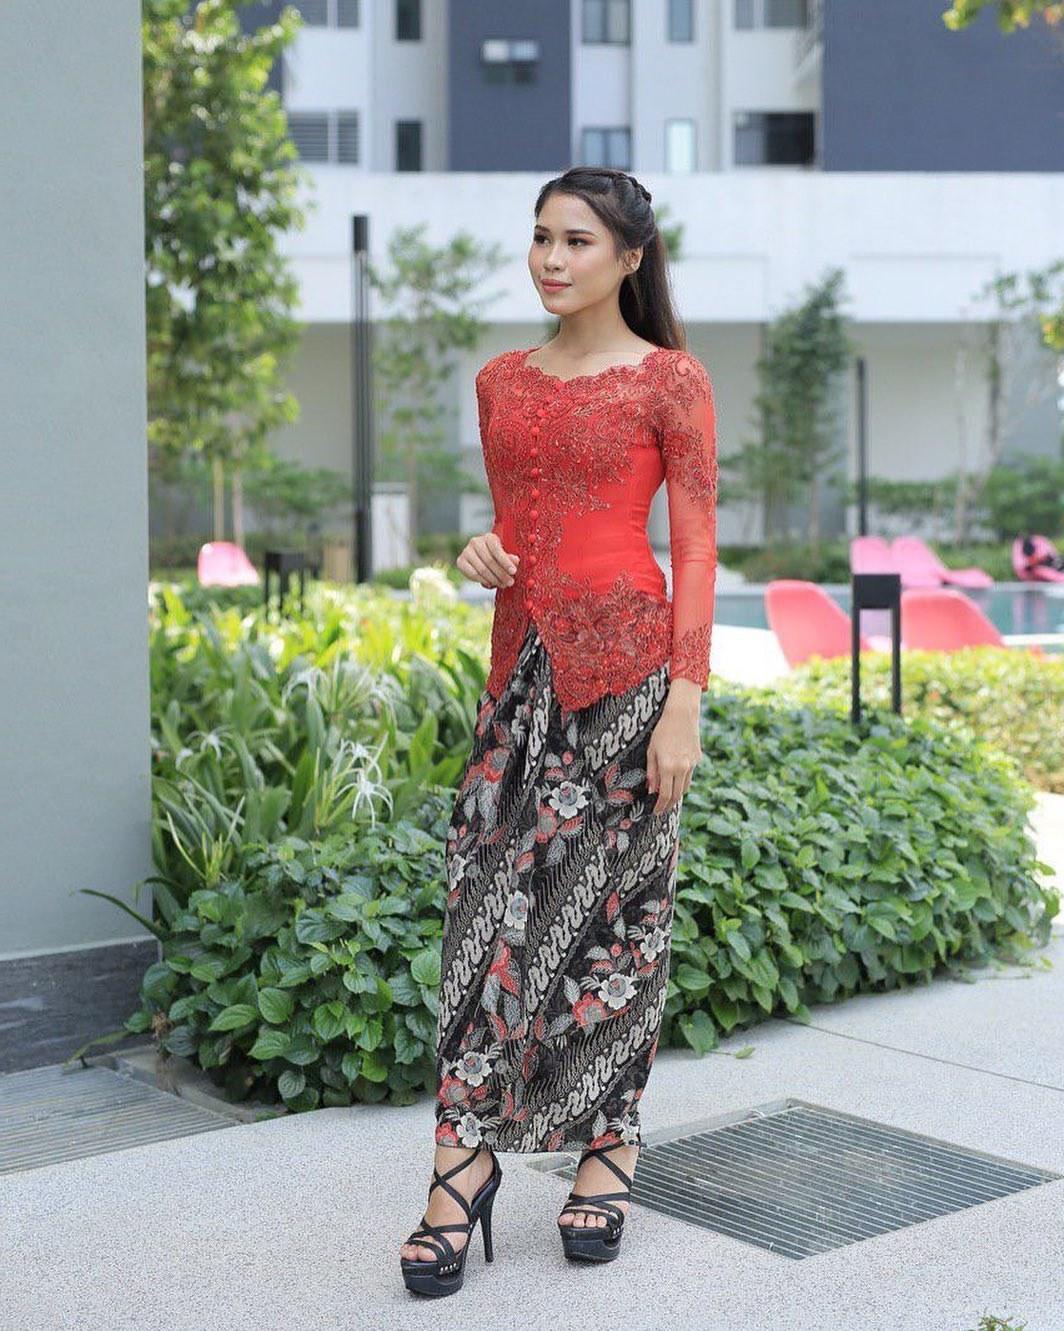 Inspirasi Baju Lebaran 2020 Anak Remaja J7do 30 Model Baju 2020 Remaja Pria Fashion Modern Dan